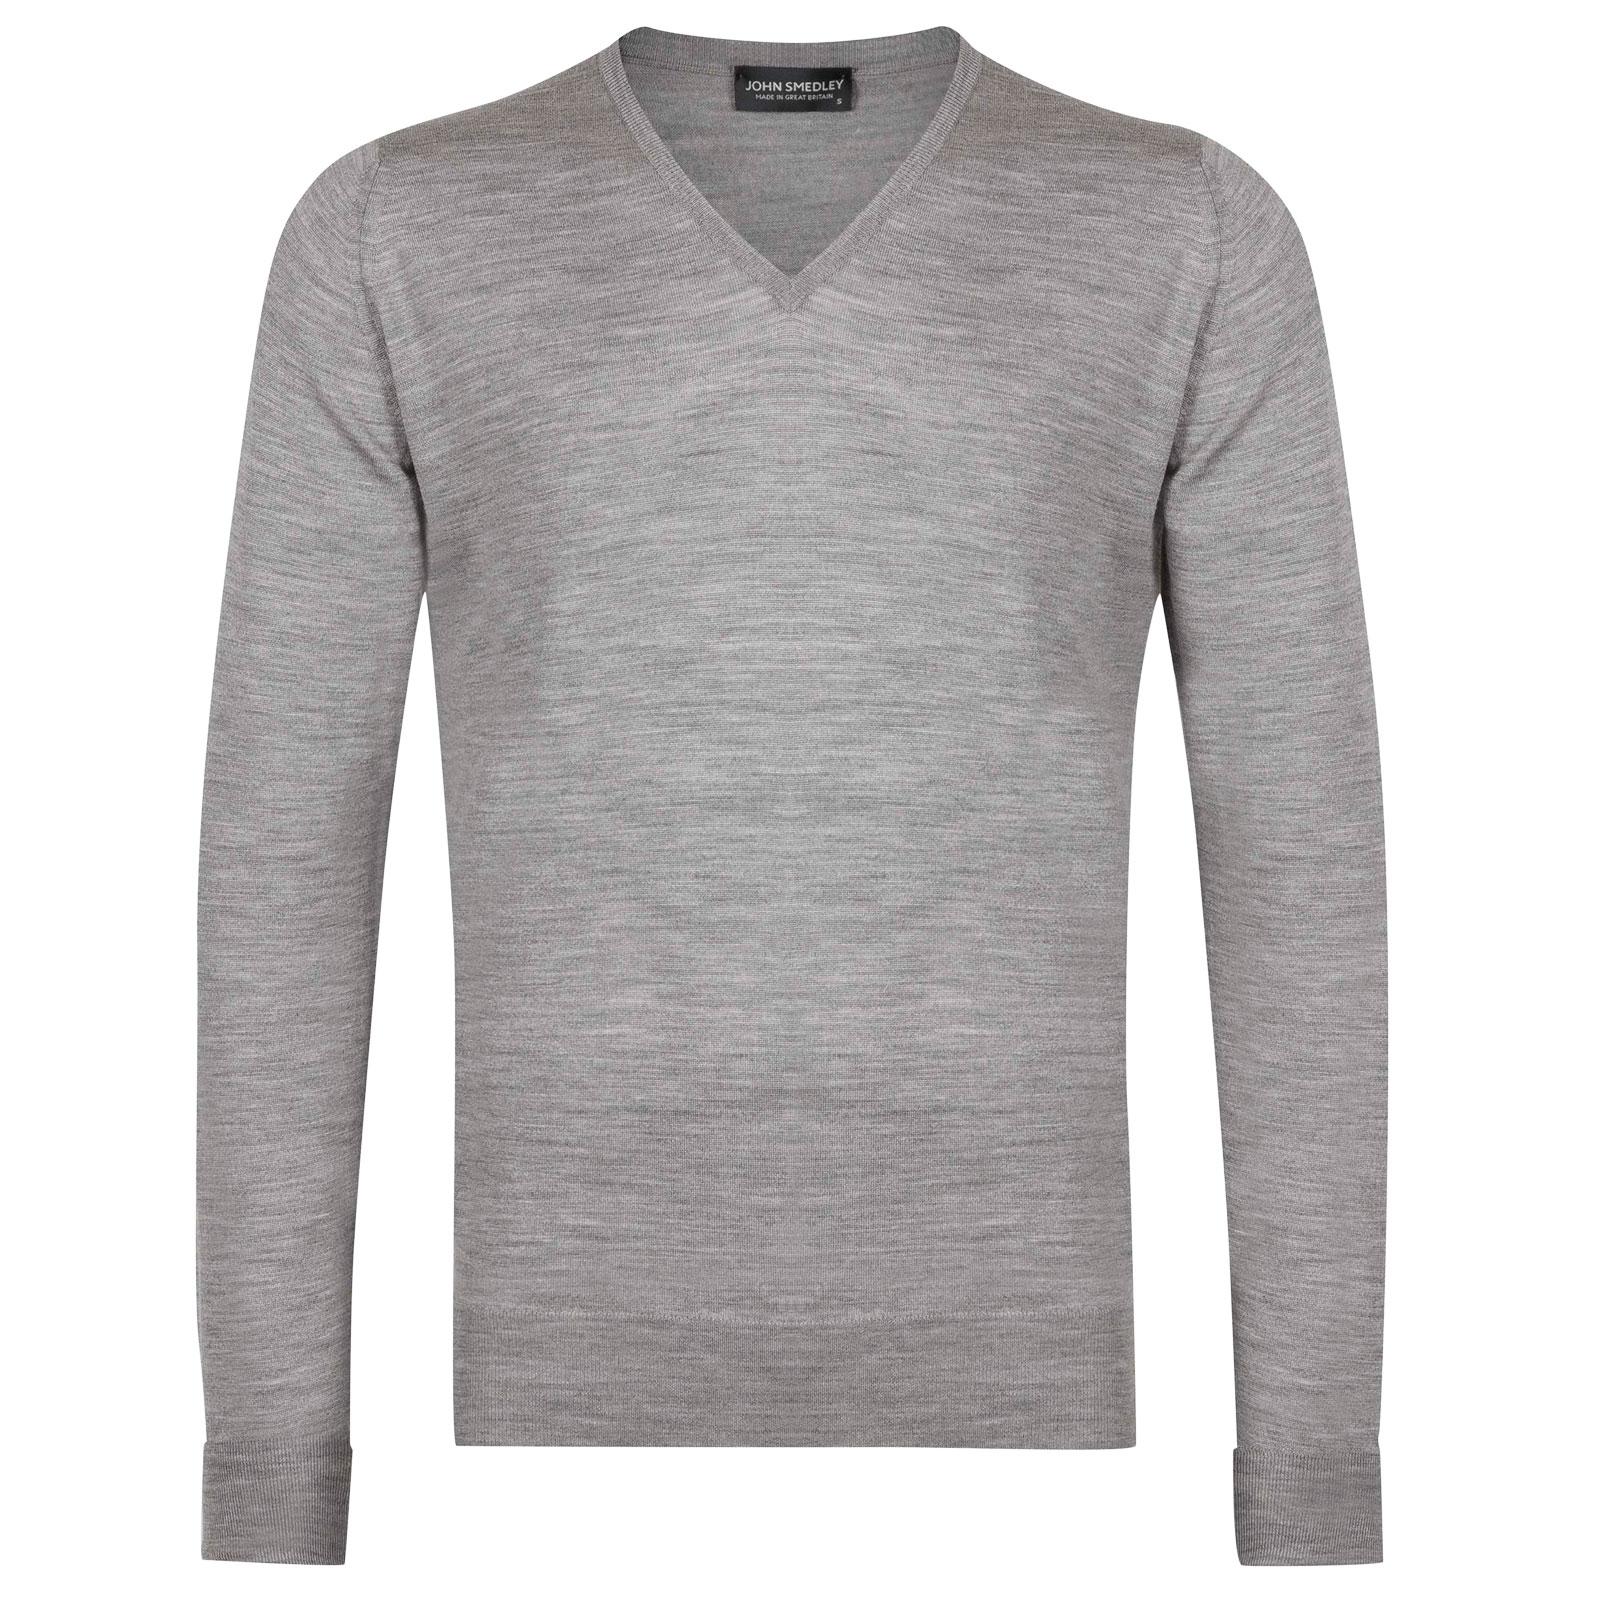 John Smedley Blenheim Merino Wool Pullover in Silver-S